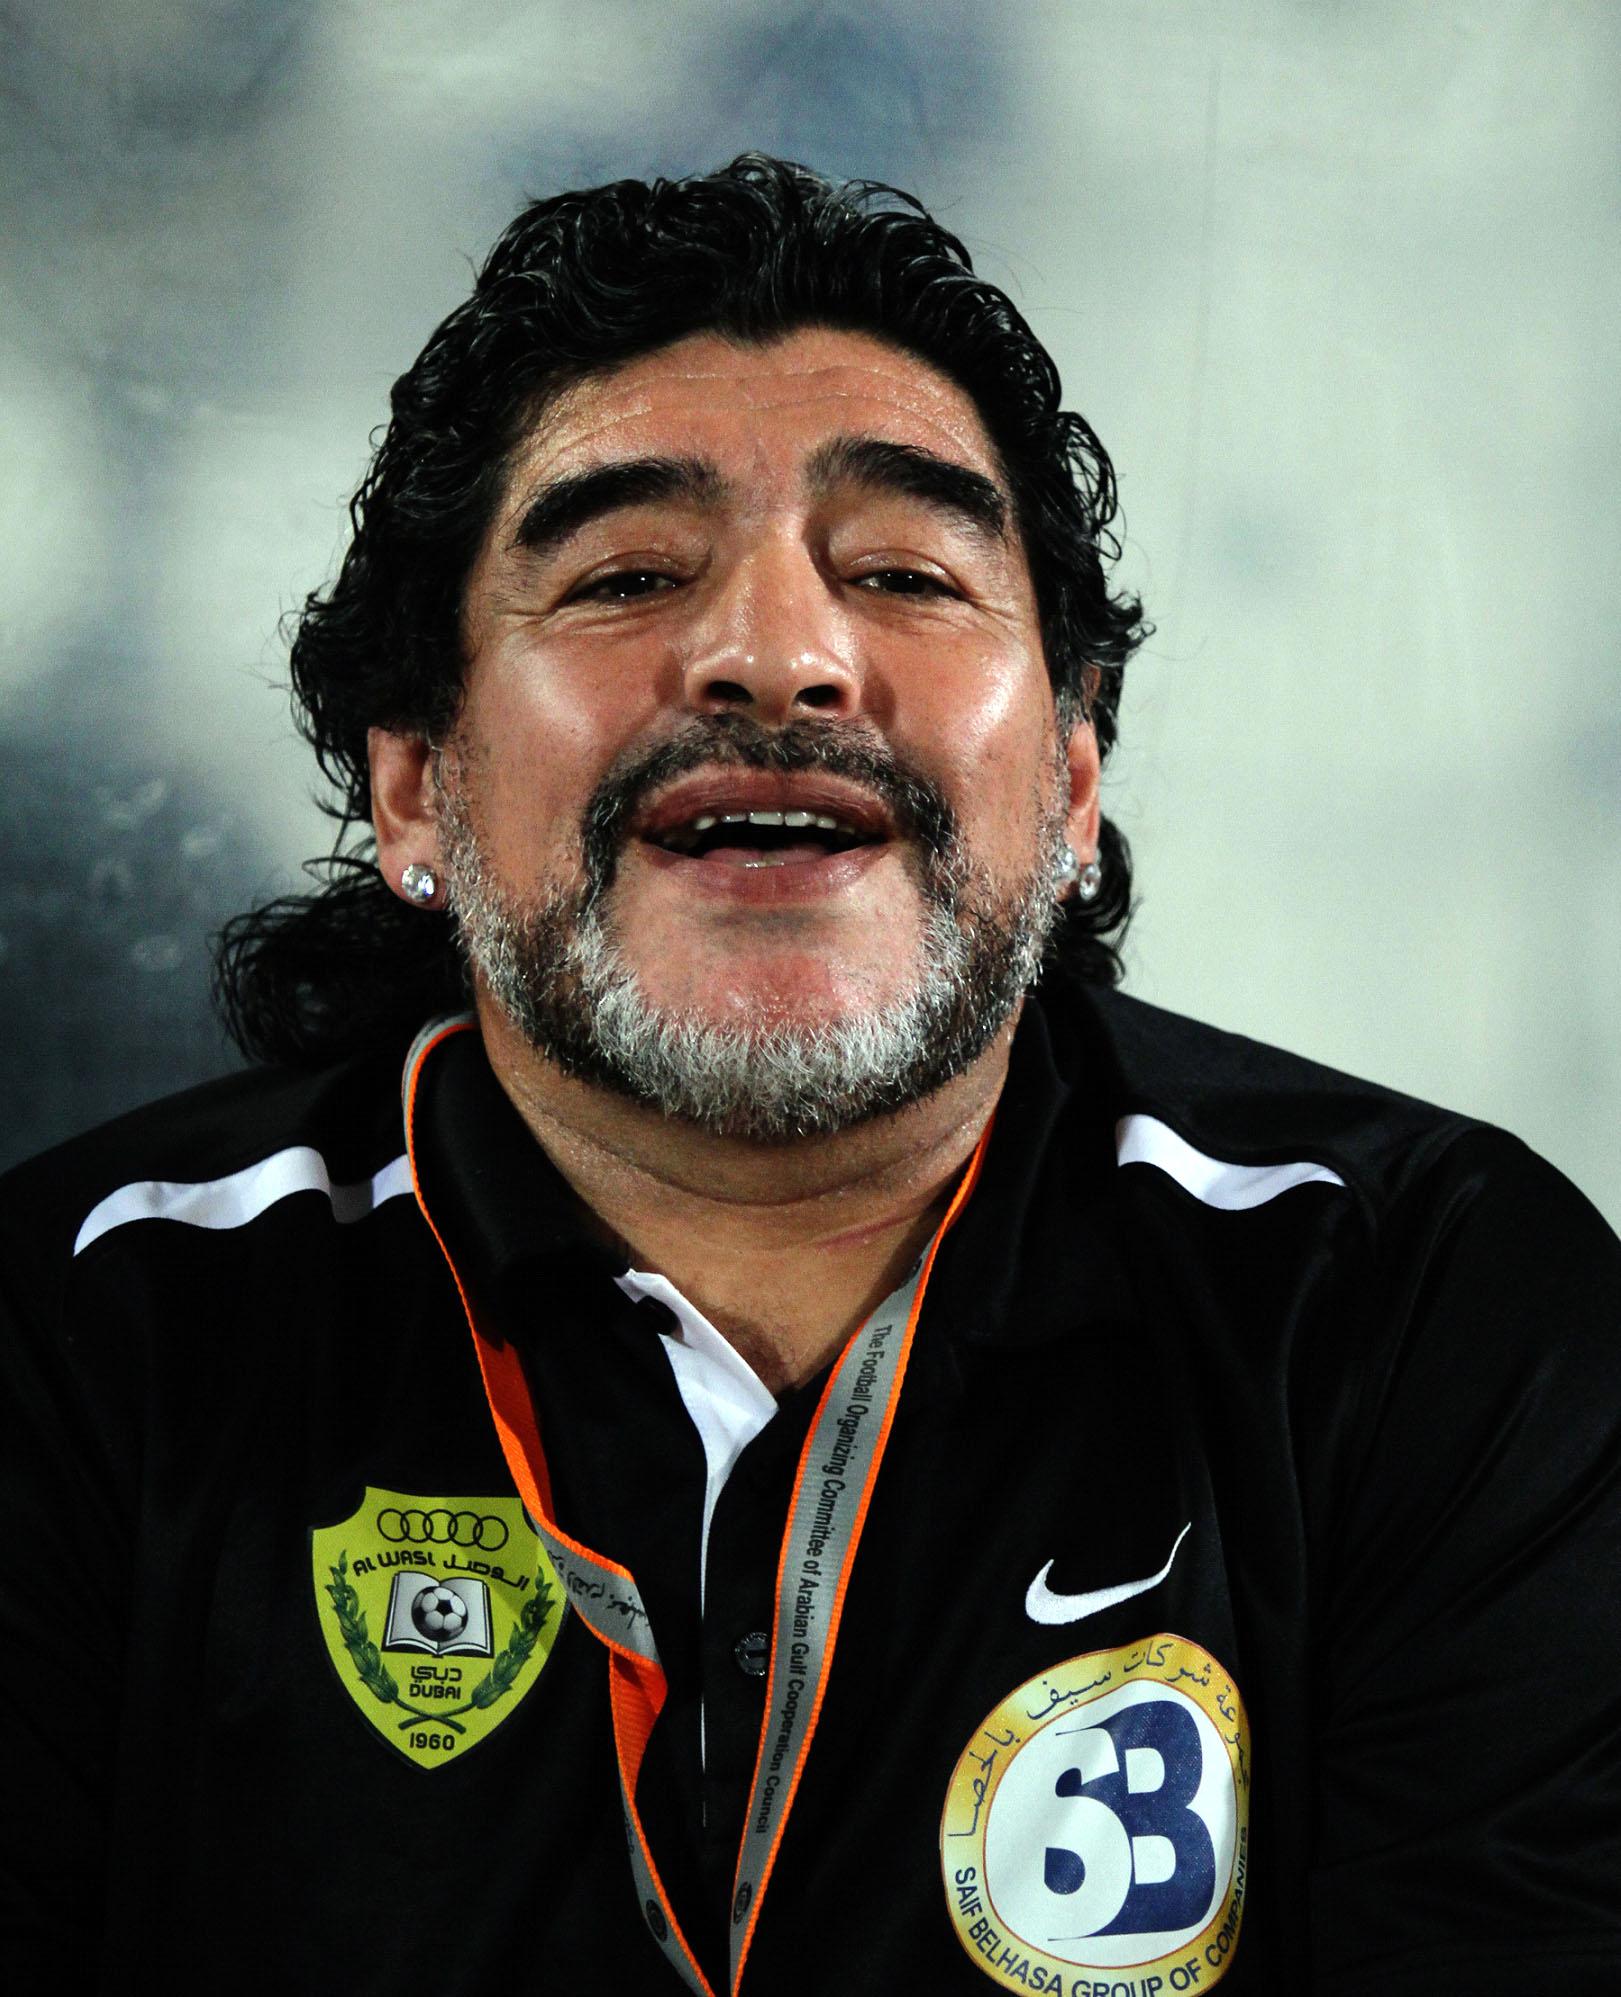 Where Diego Armando Maradona is a God, Literally   Maradona